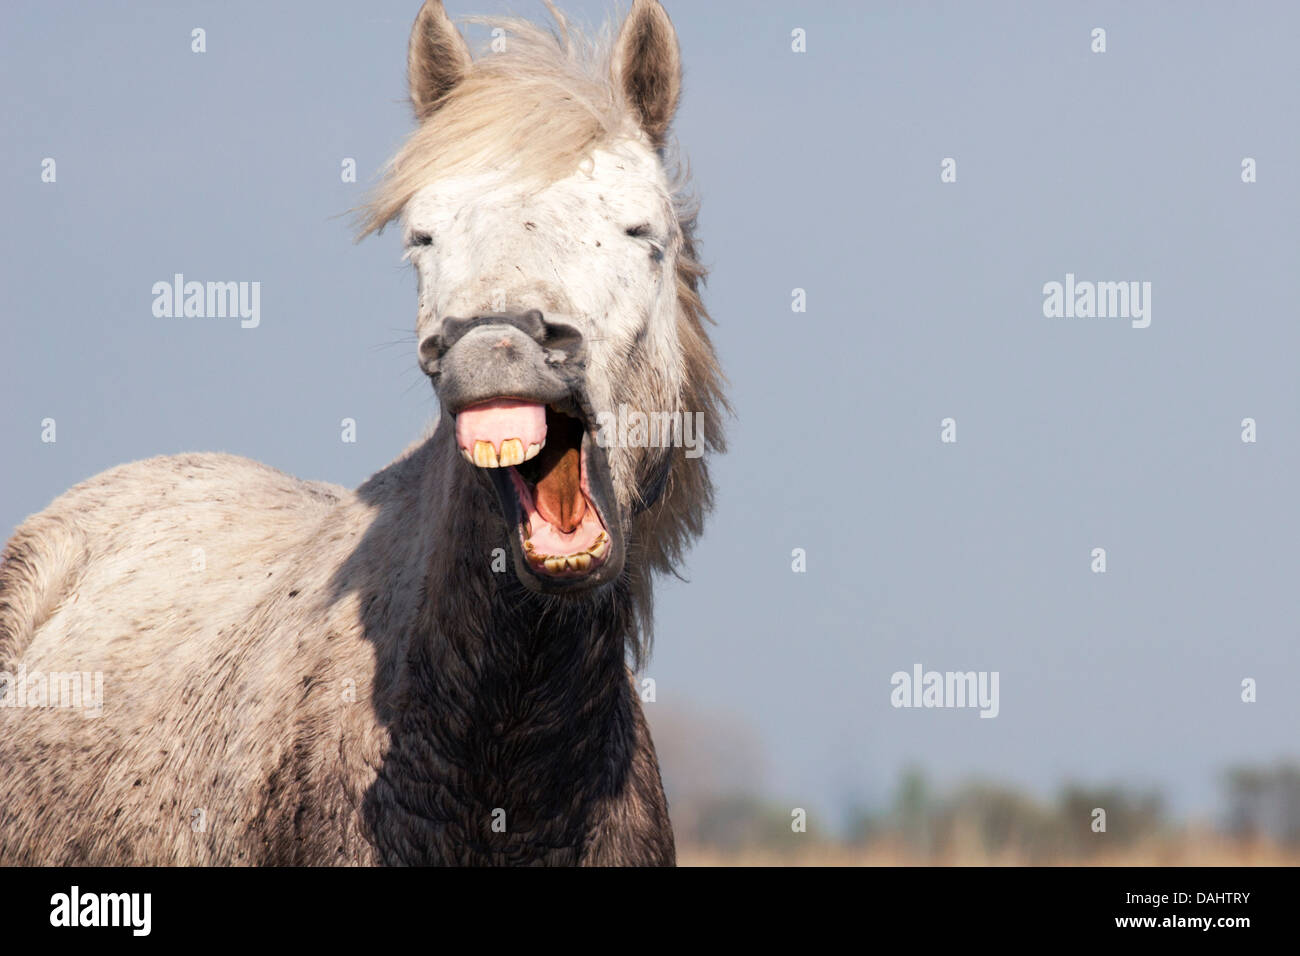 Muddy Horse Making Funny Face Stock Photo Alamy